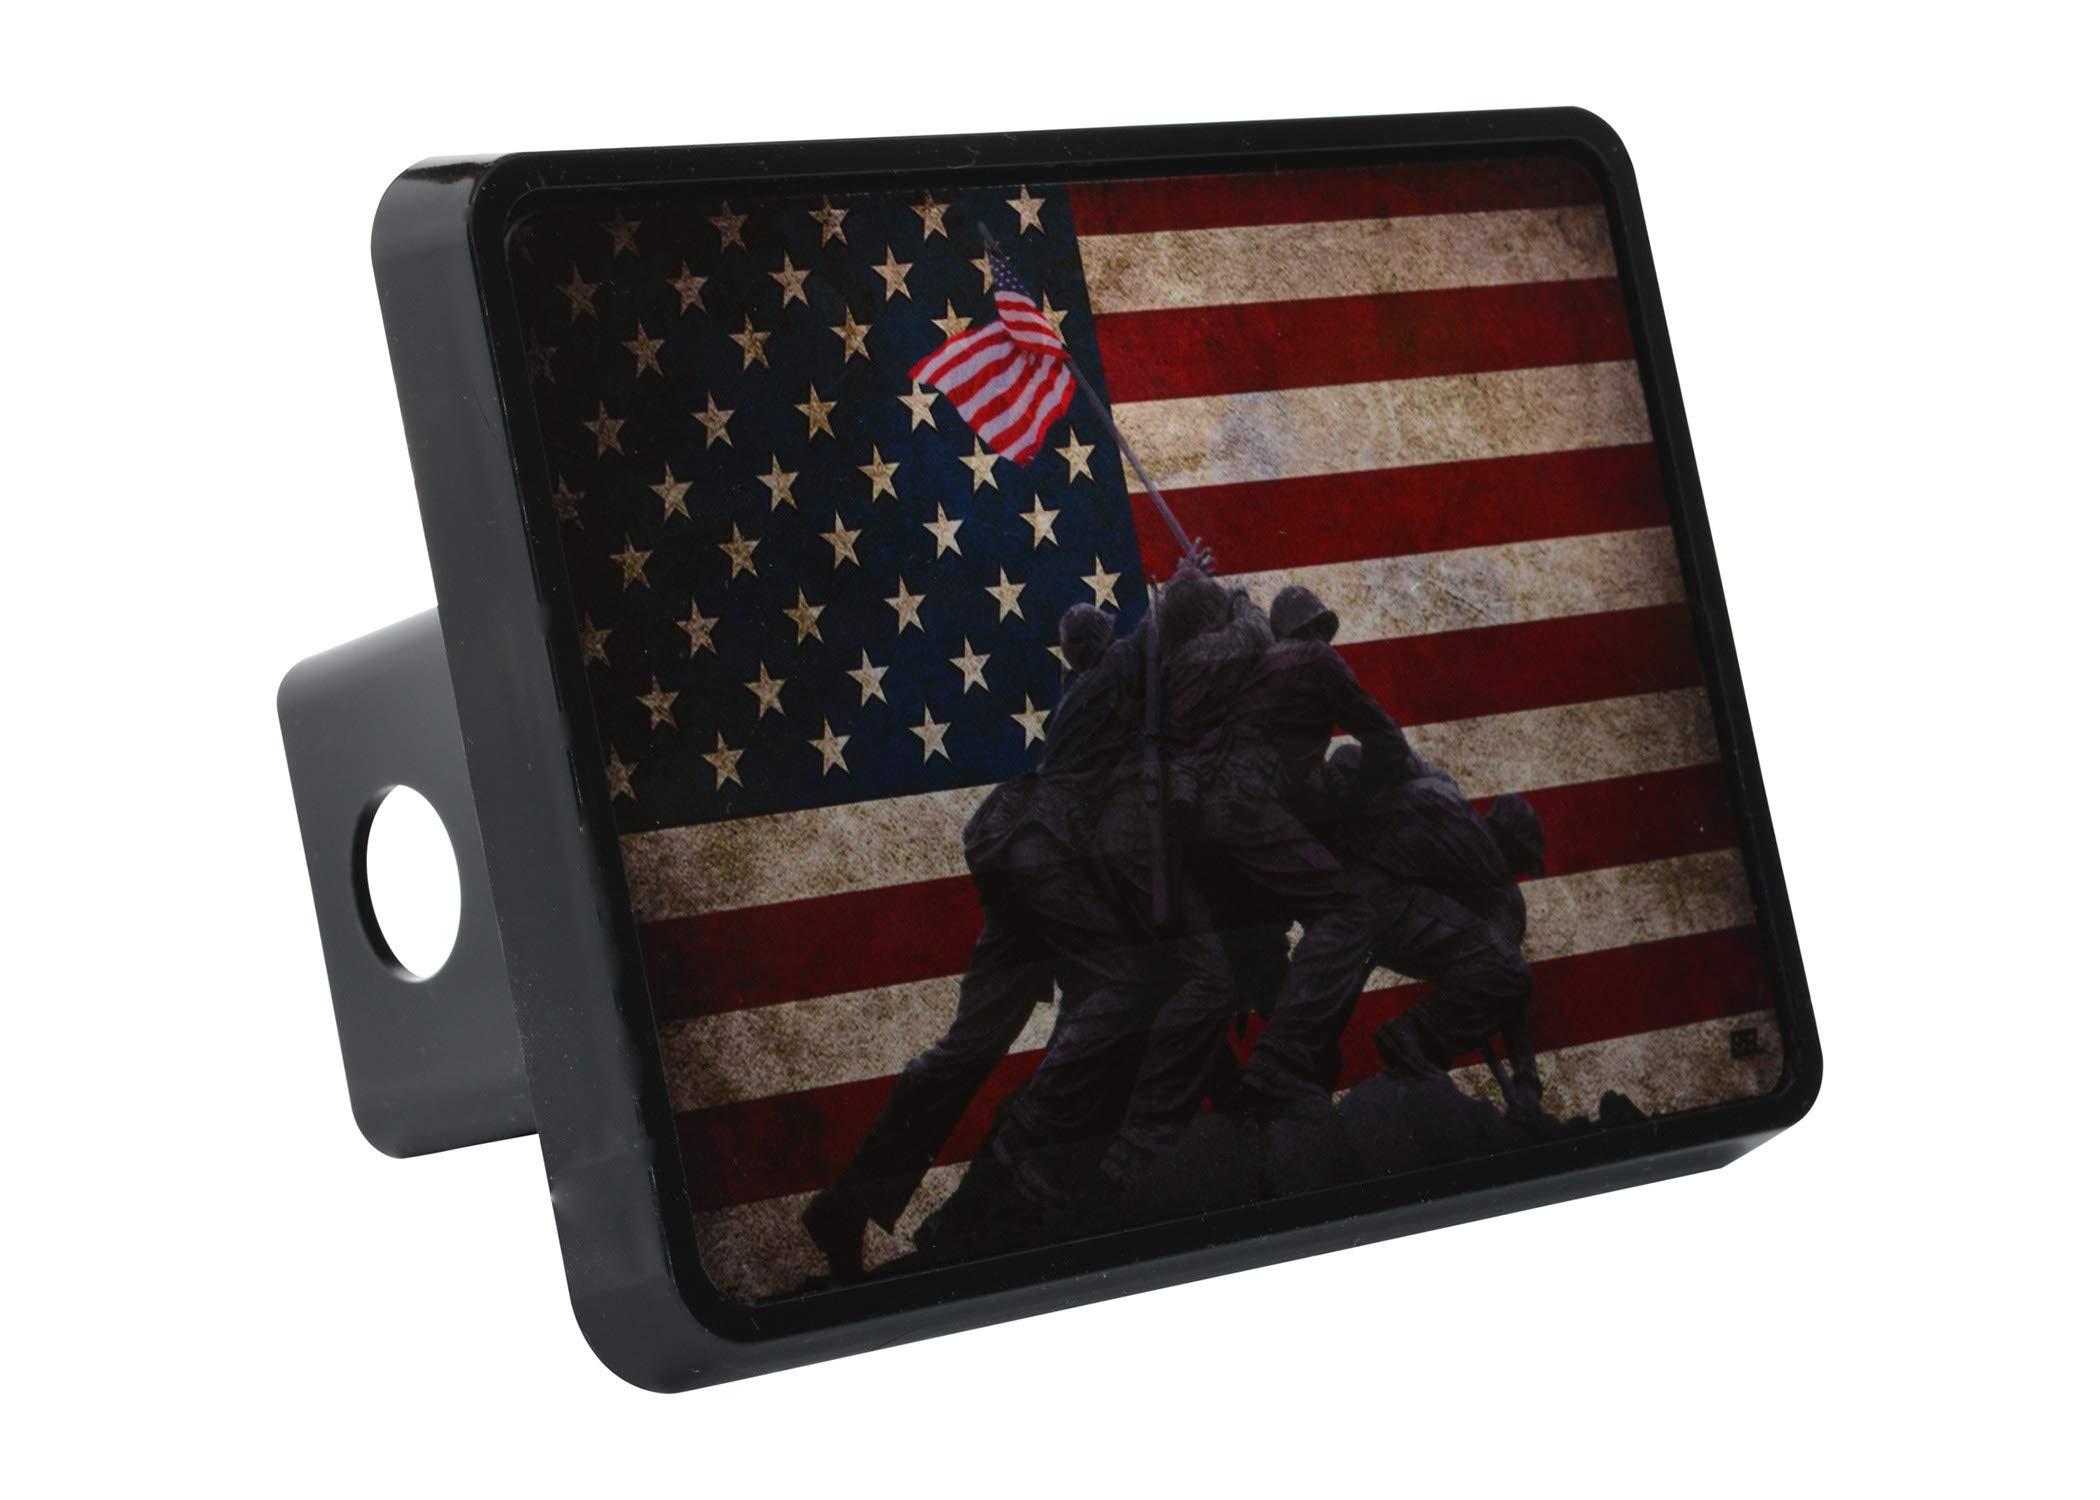 Rogue River Tactical USA Flag Iwo Jima Trailer Hitch Cover Plug US Patriotic Veteran WW2 Memorial by Rogue River Tactical